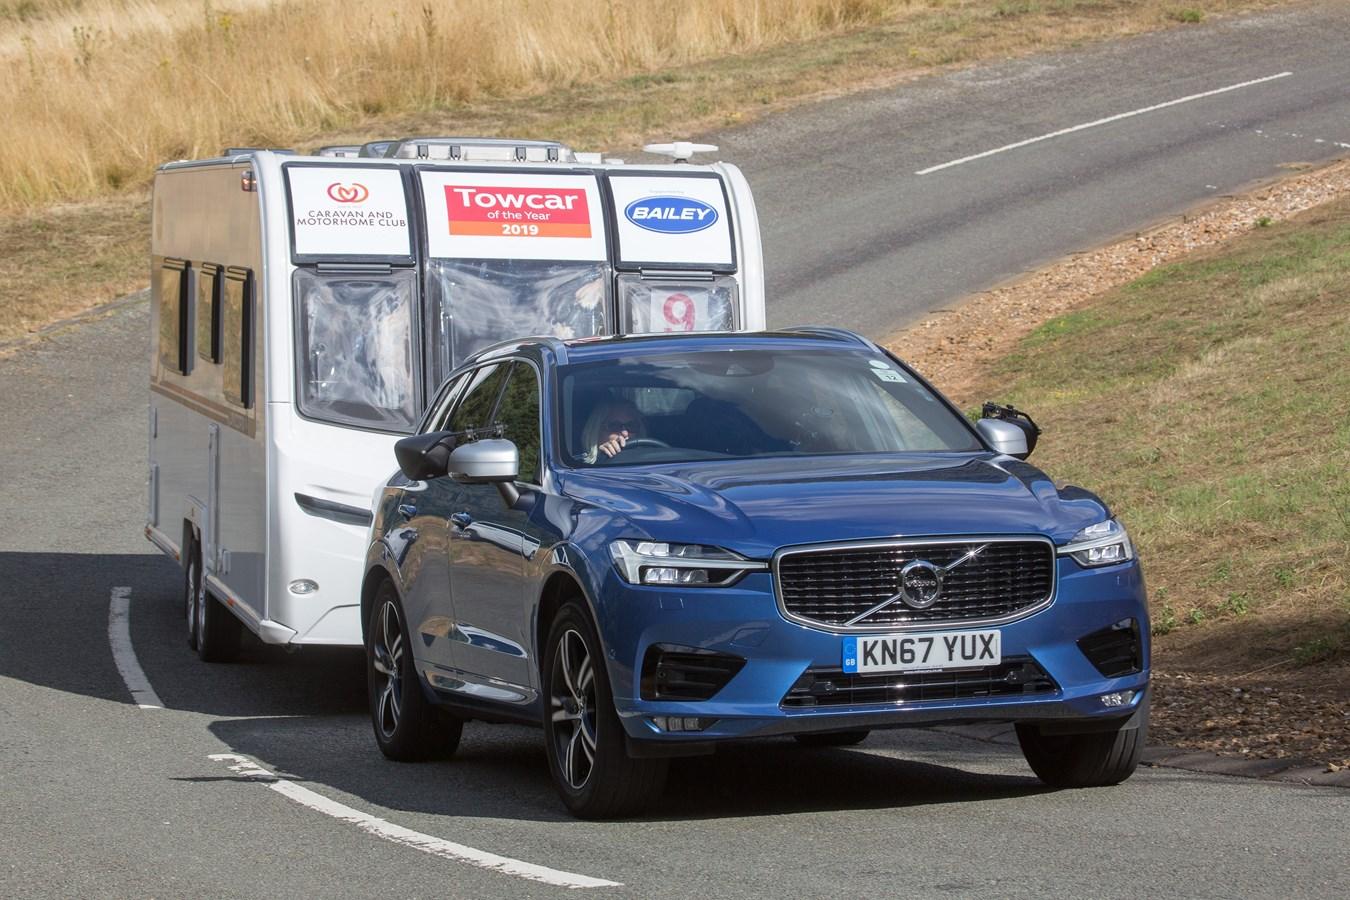 Volvo XC60 wins three titles in 2019 Caravan and Motorhome Club